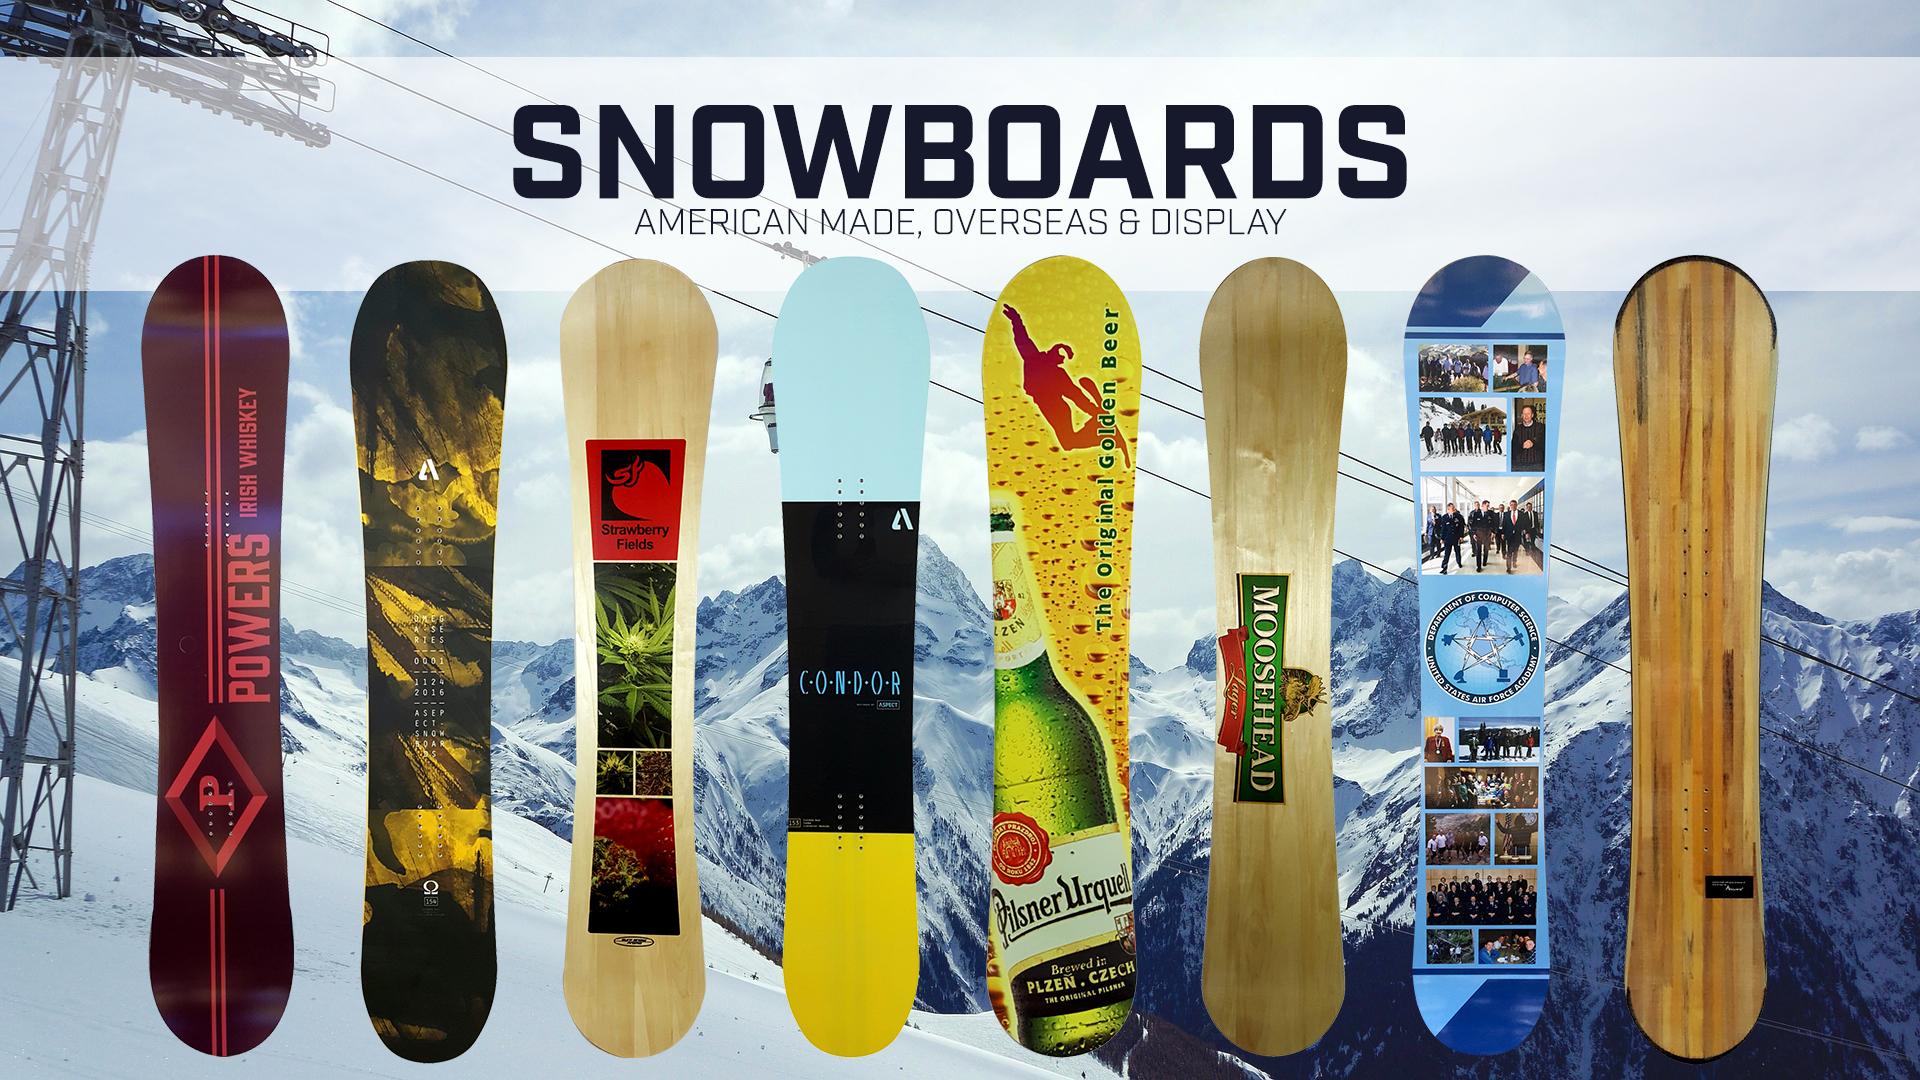 snowboards_showcase.jpg